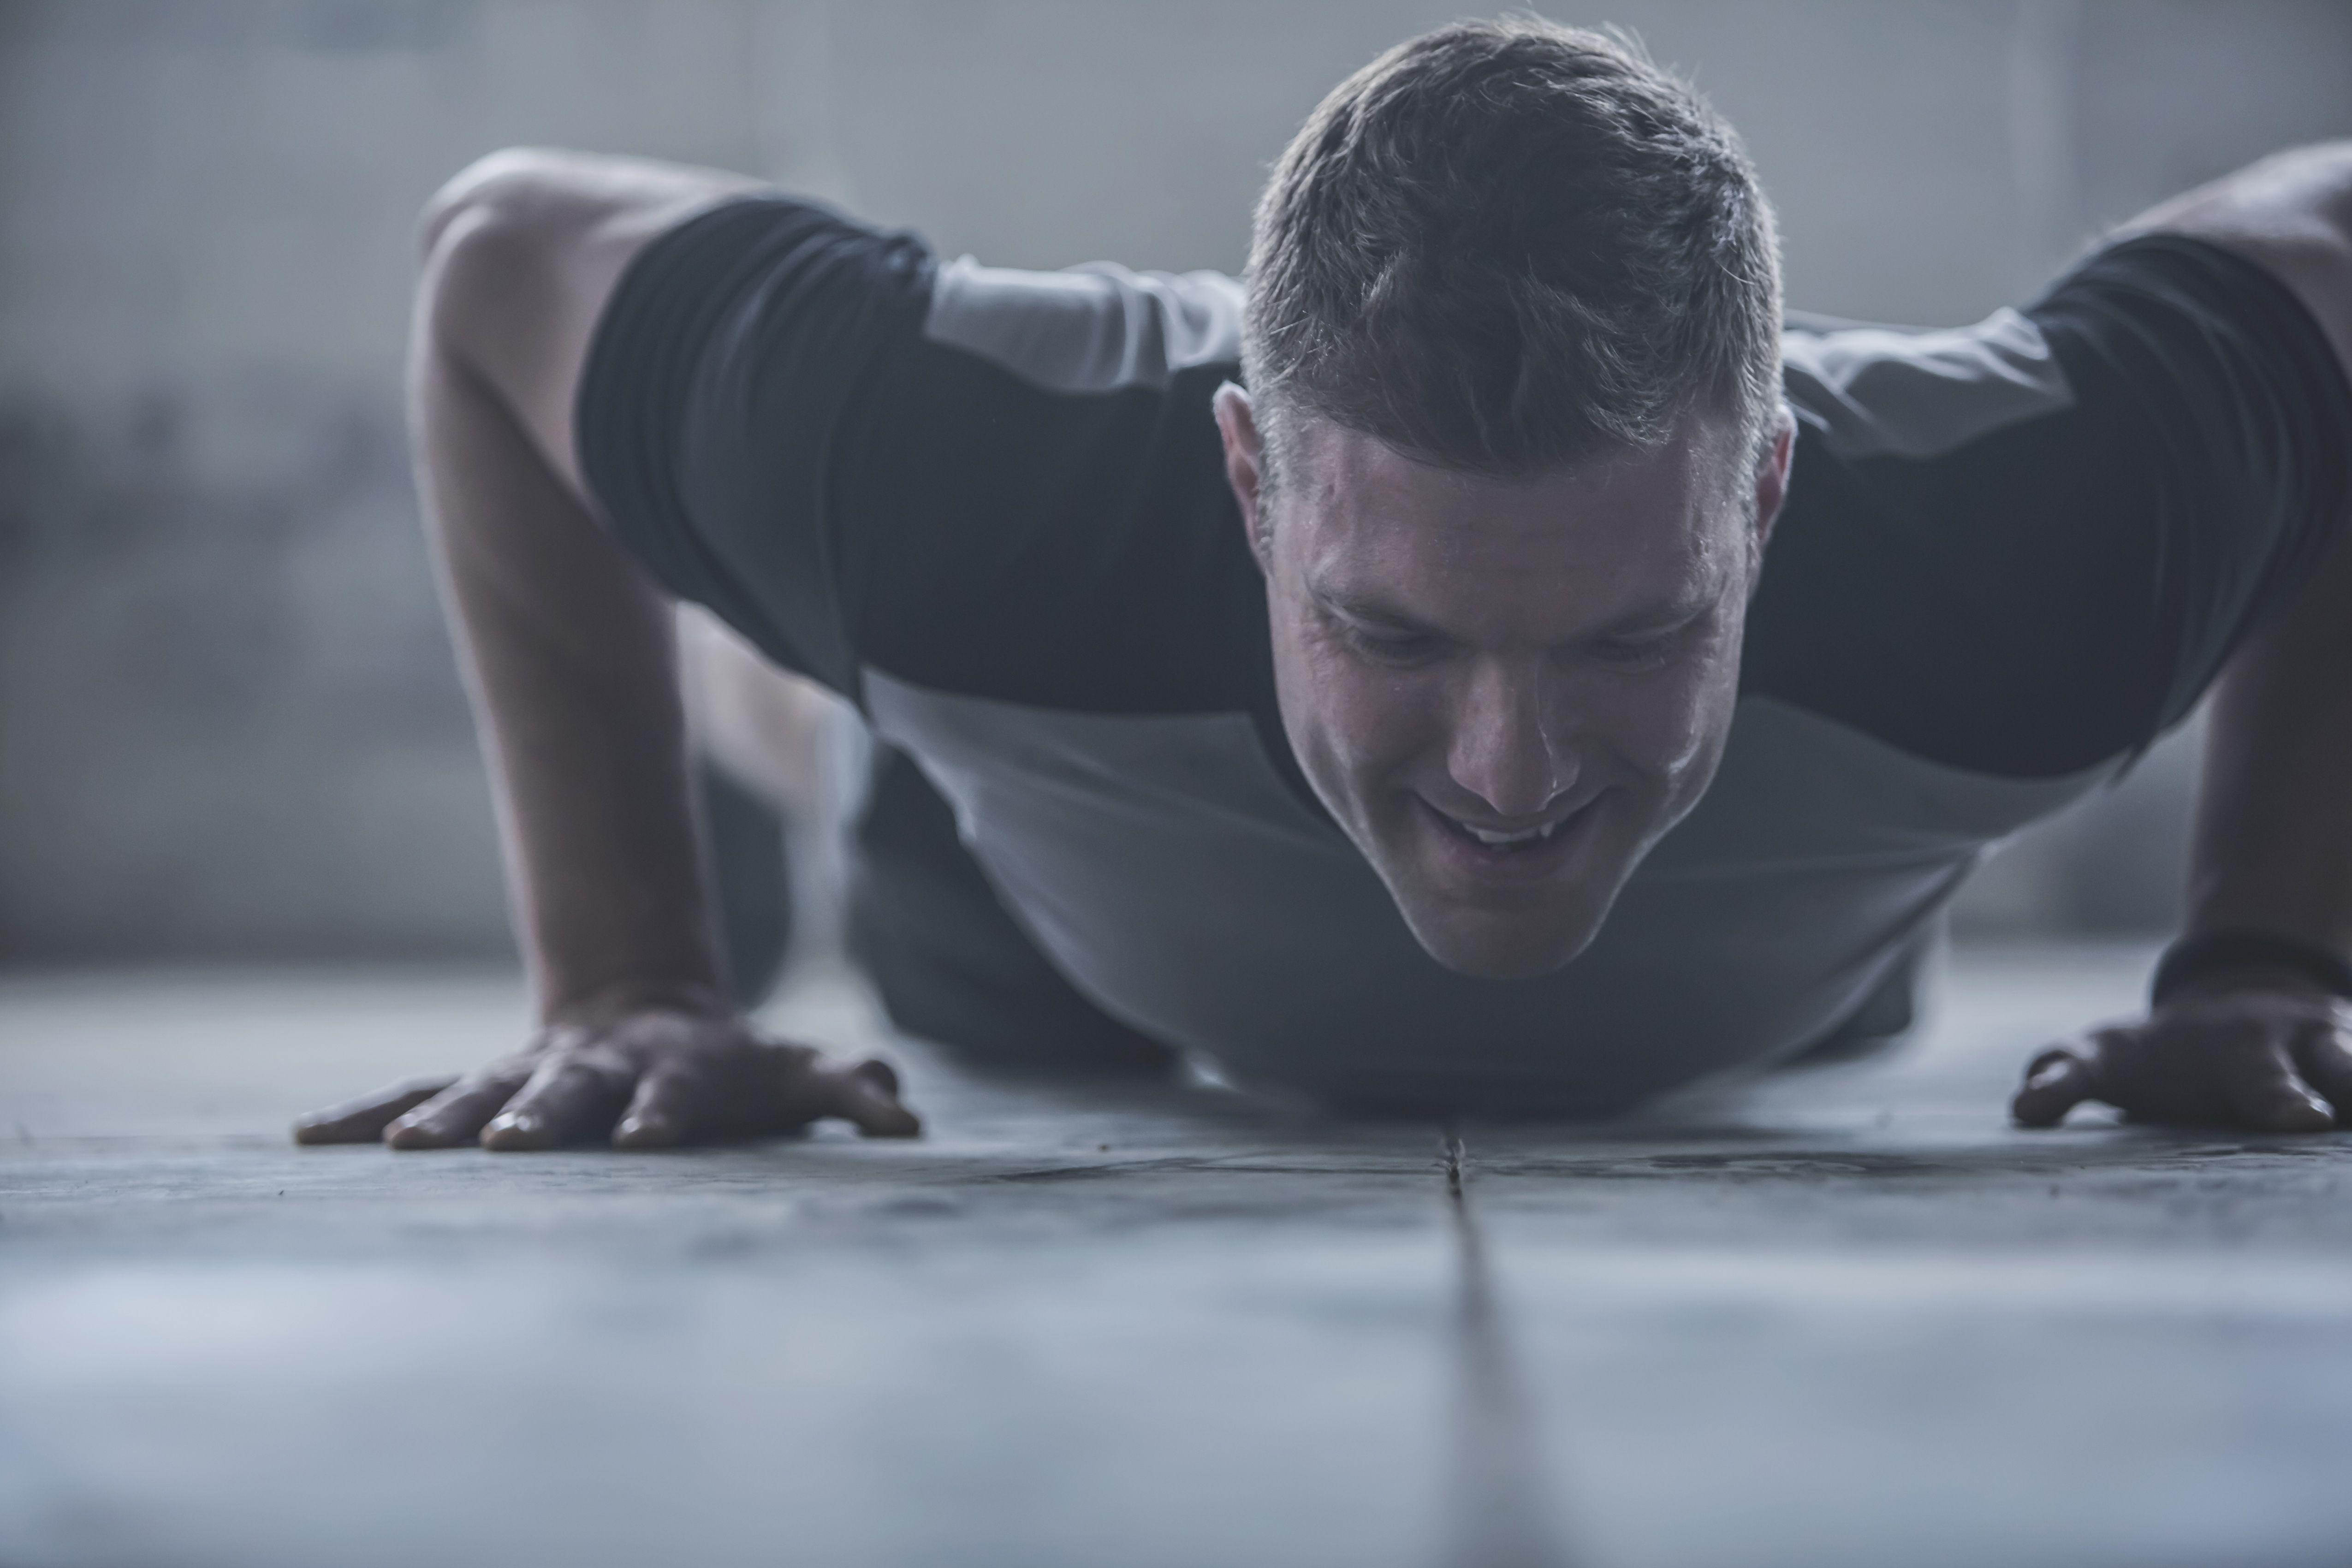 Caucasian athlete doing push-ups on floor